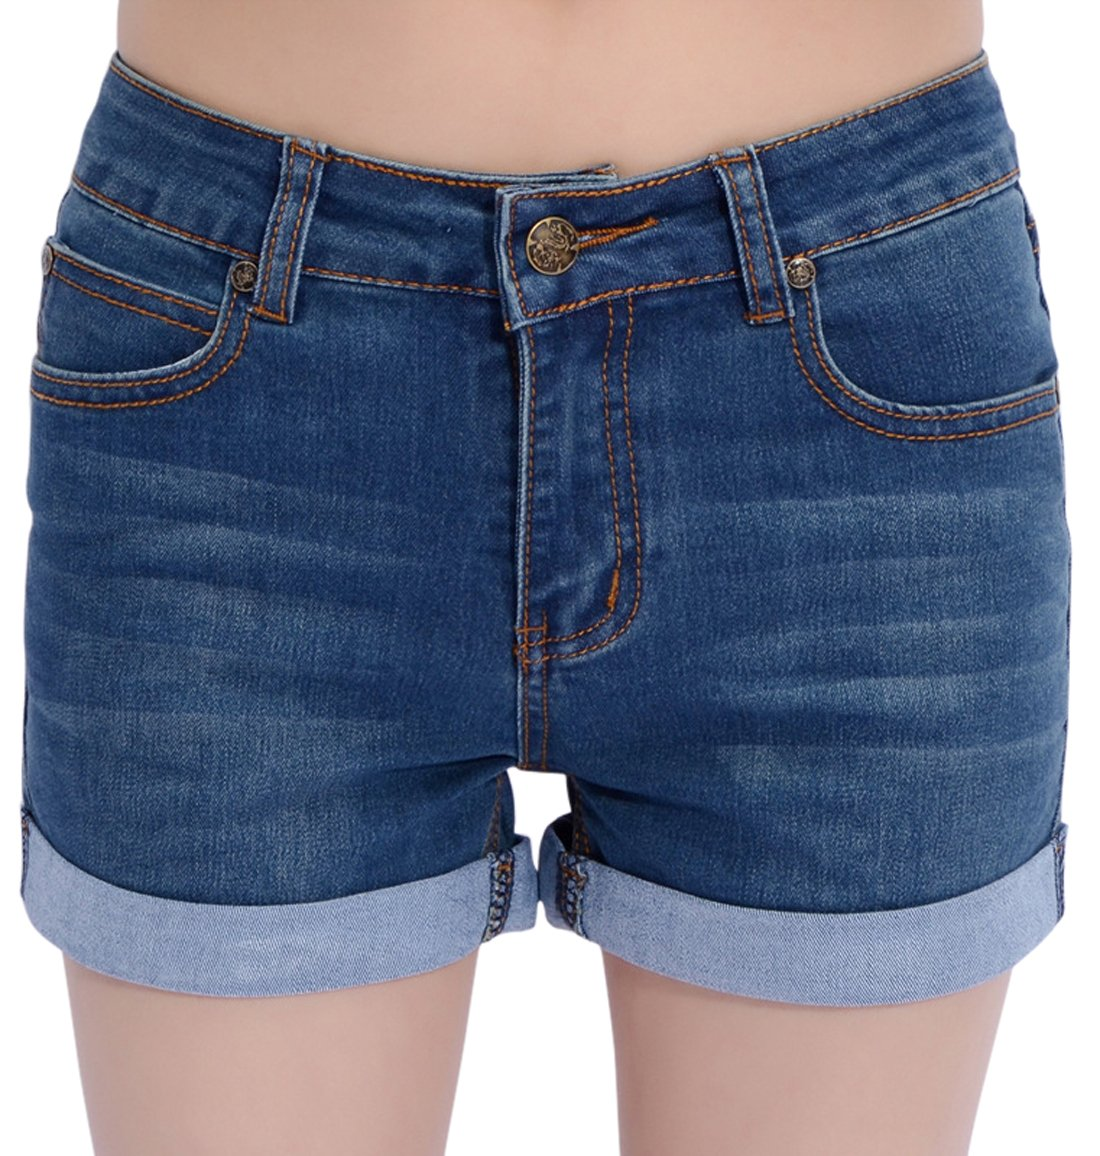 Chouyatou Women's Basic Stretched Mid-Rise Turn-up Cratched Denim Shorts (Large, Blue)